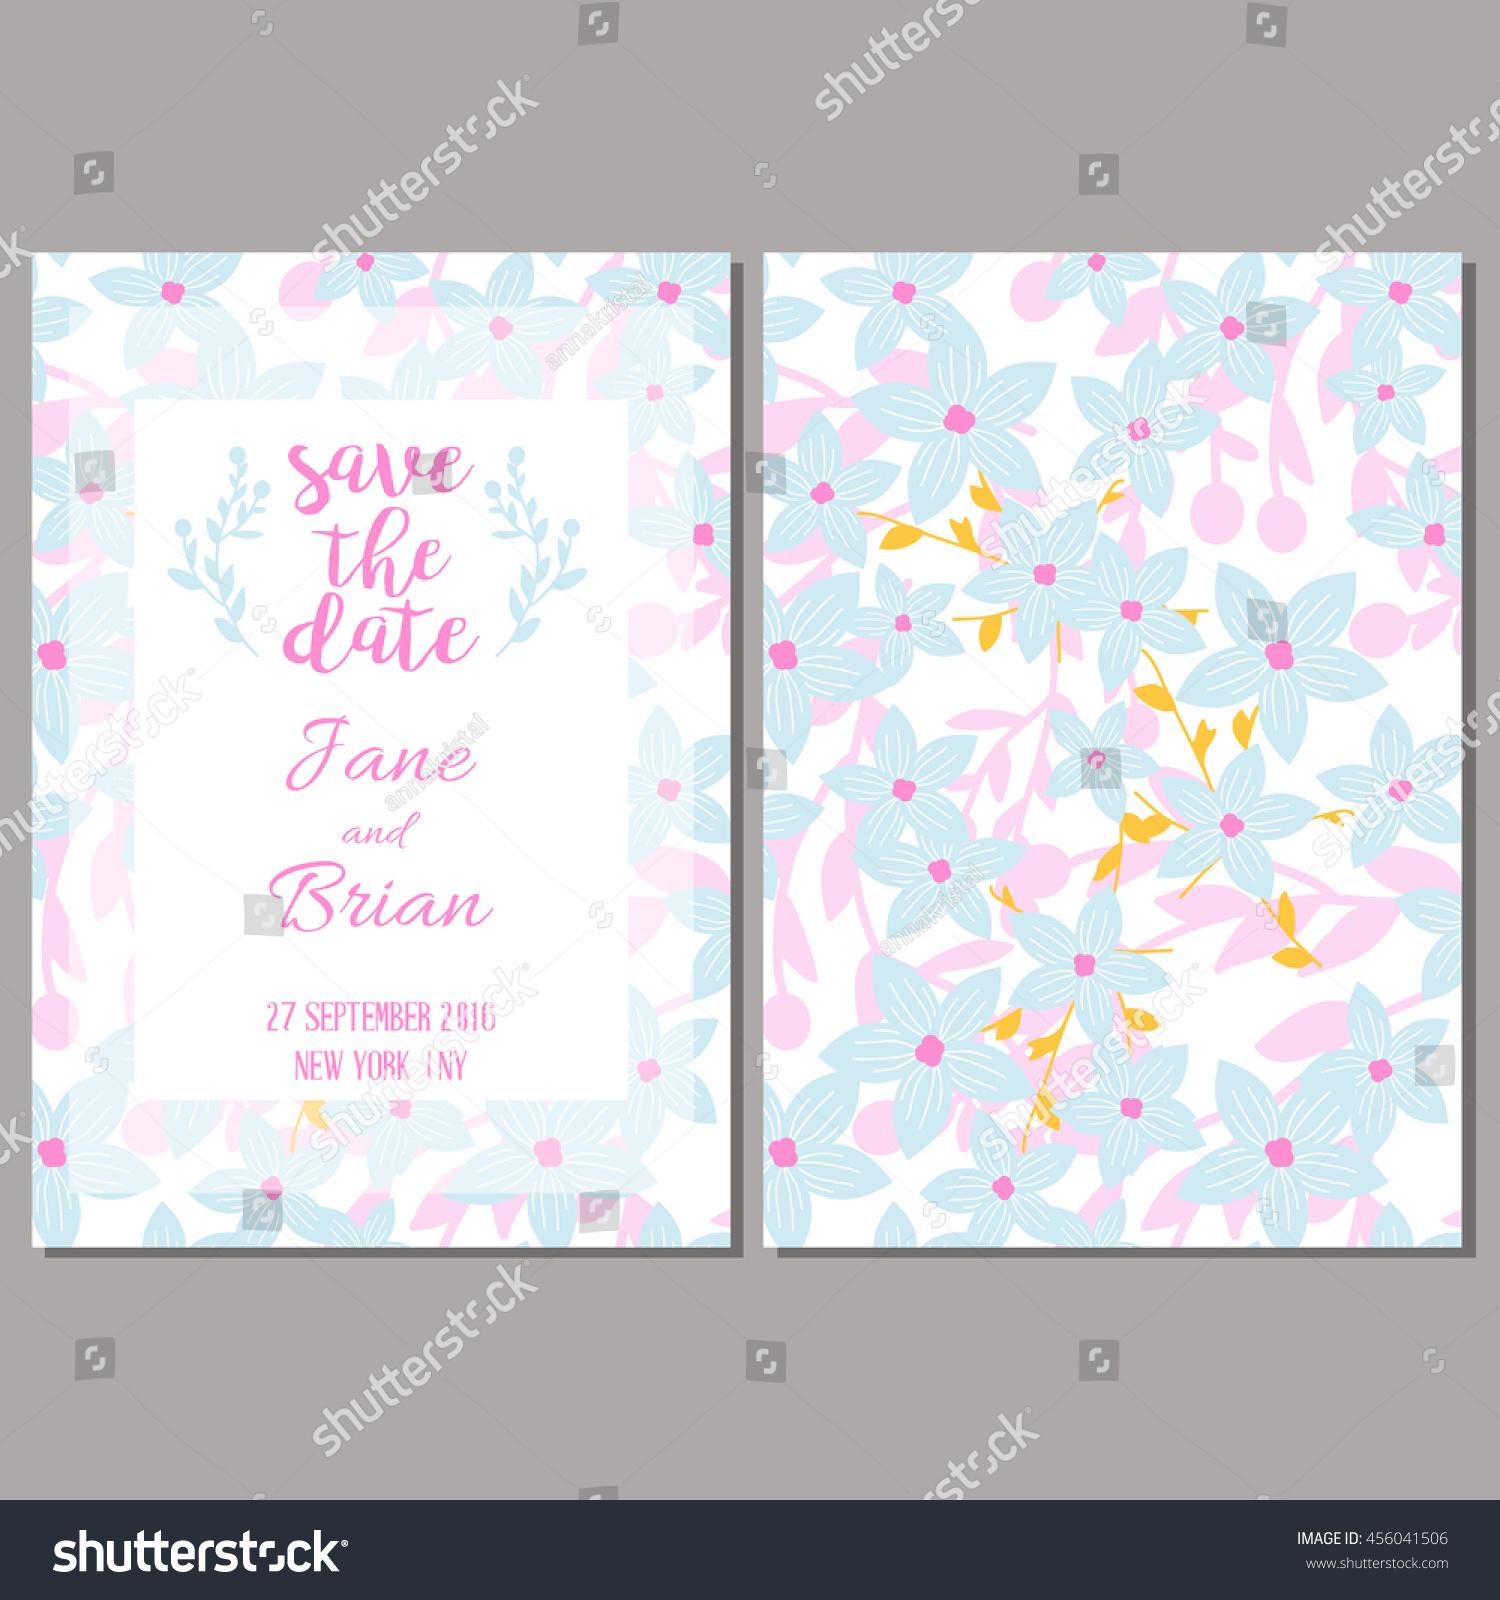 Save The Data Card Template Wedding Invitation Baby Shower Menu